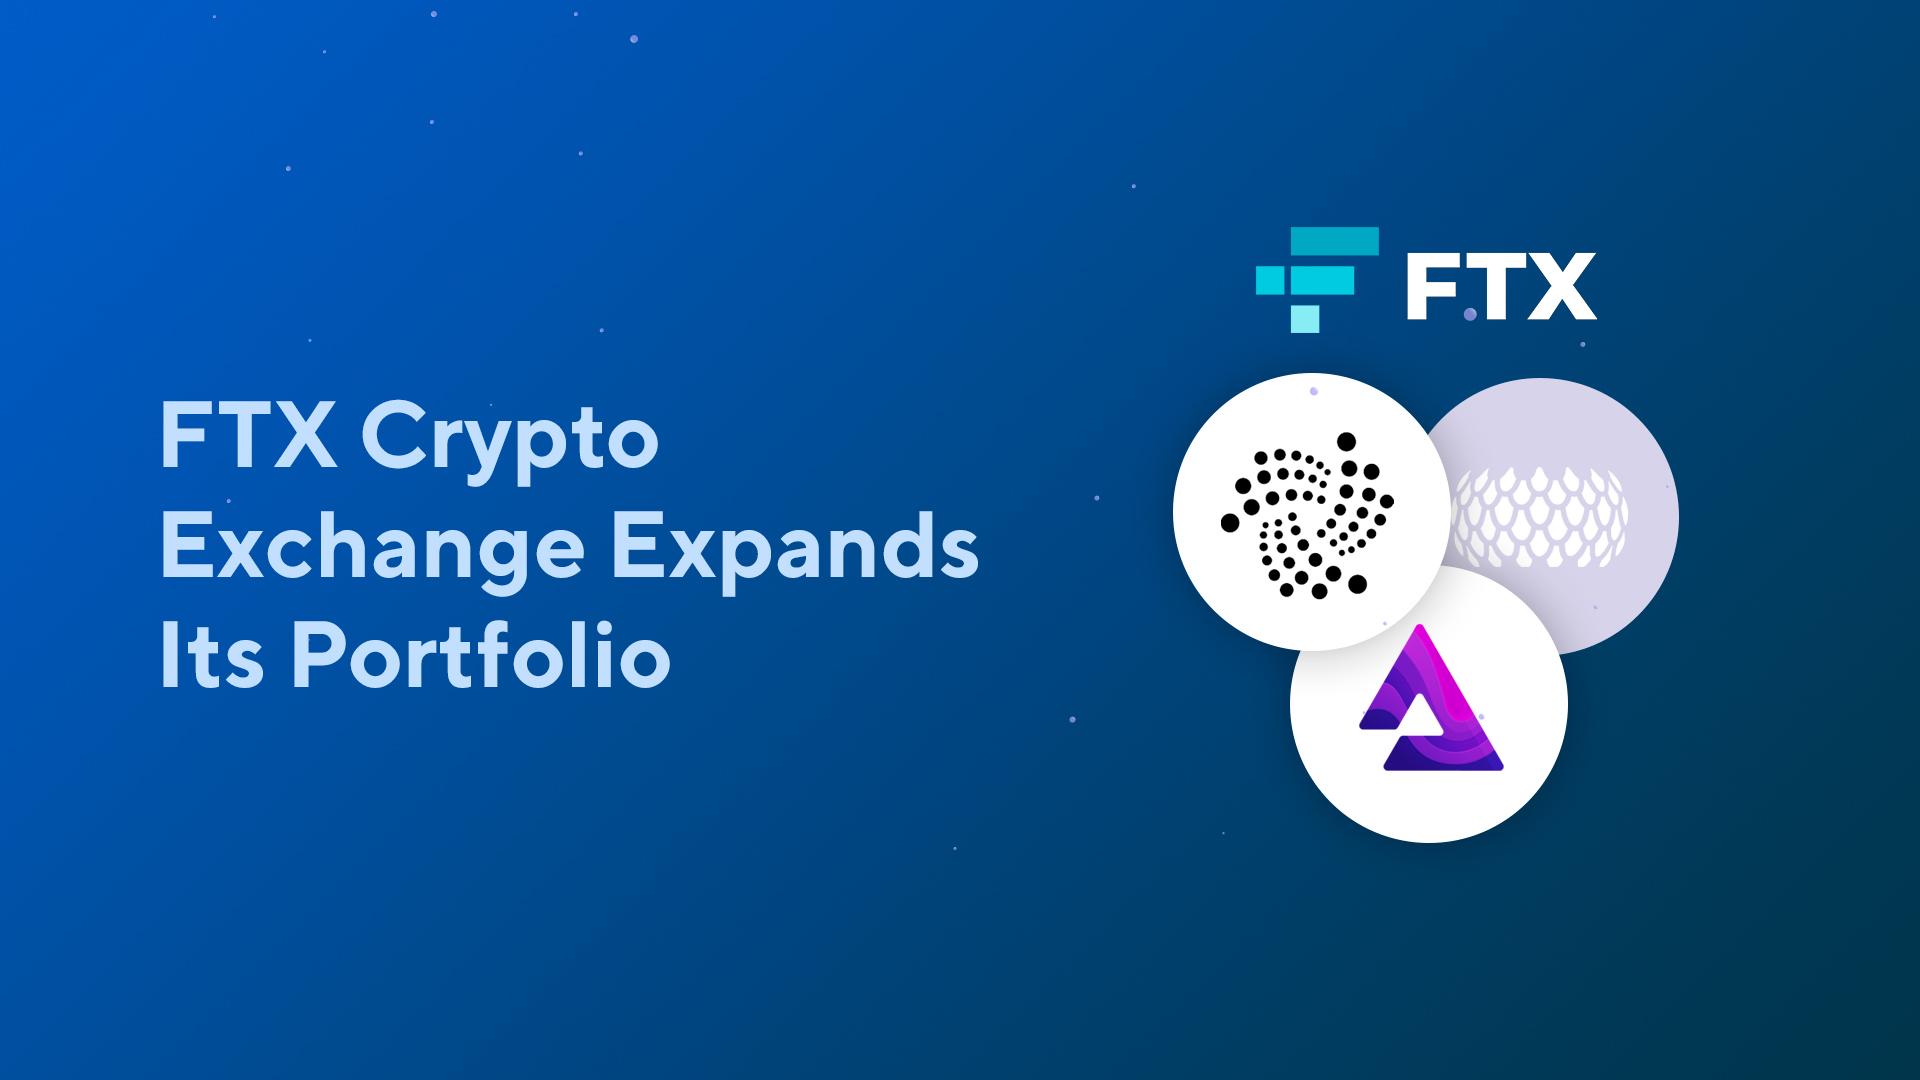 FTX Crypto Exchange Expands Its Portfolio